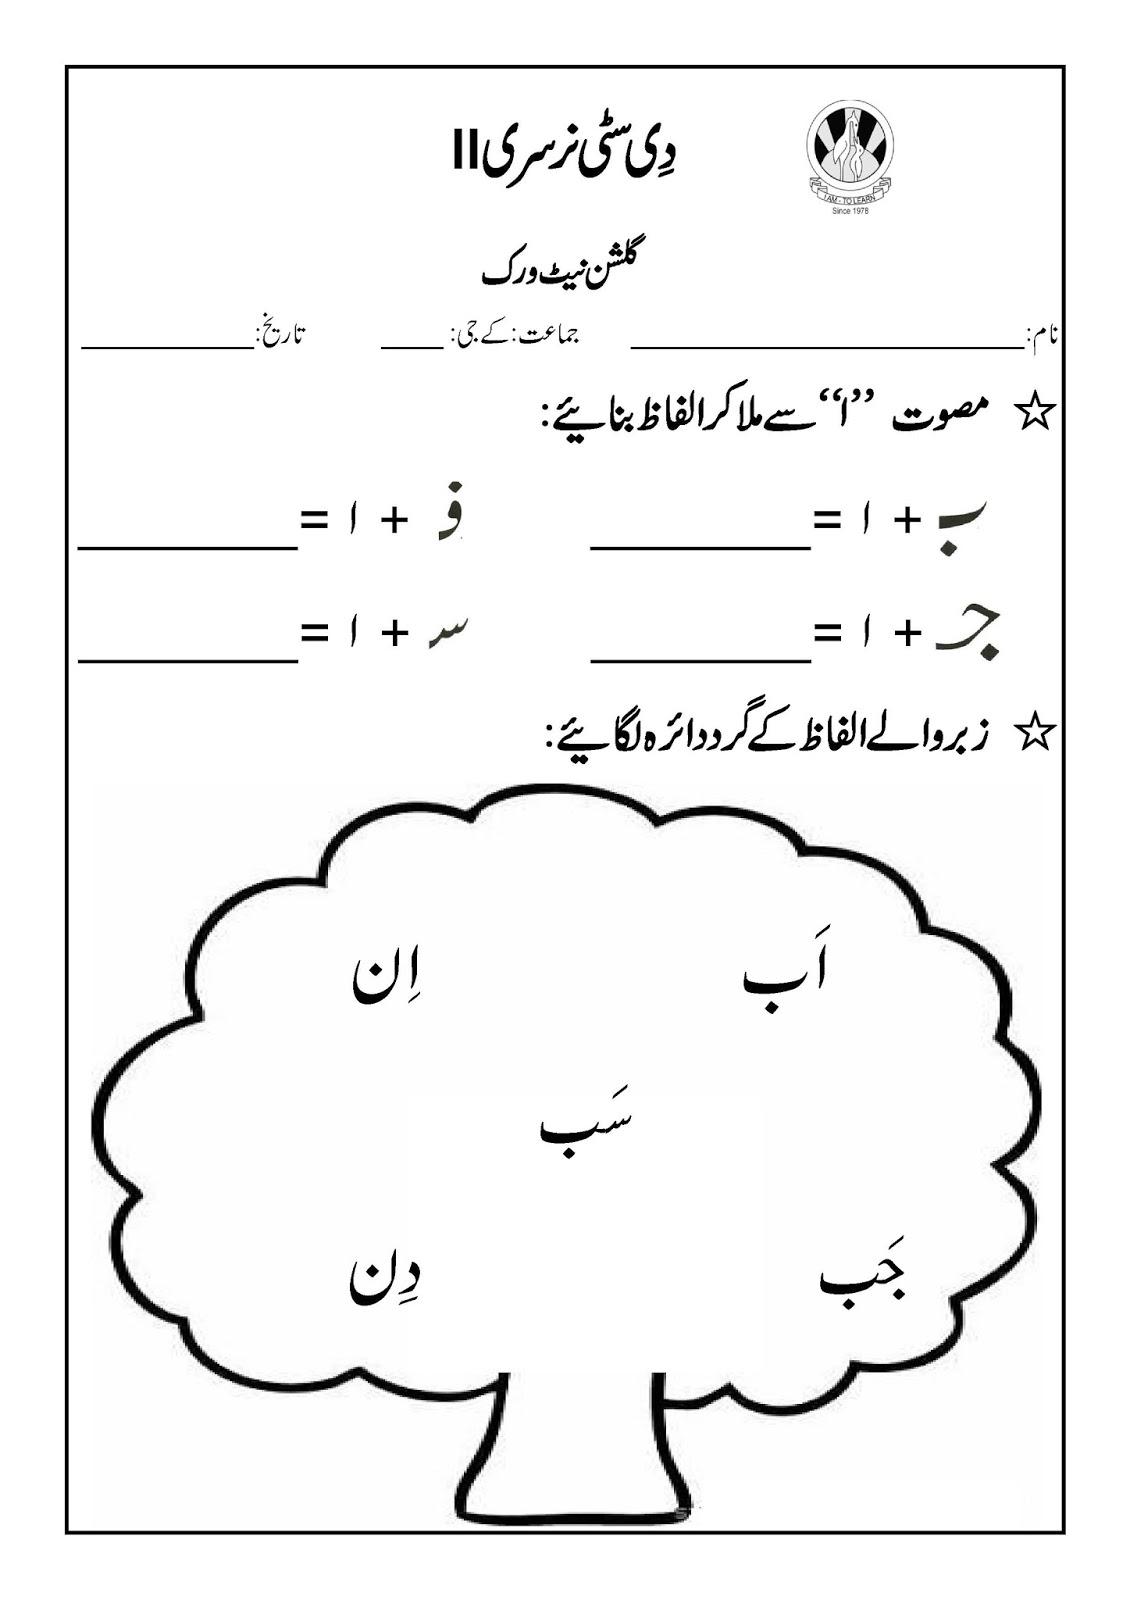 Tafheem Worksheets In Urdu   Printable Worksheets and Activities for  Teachers [ 1600 x 1130 Pixel ]